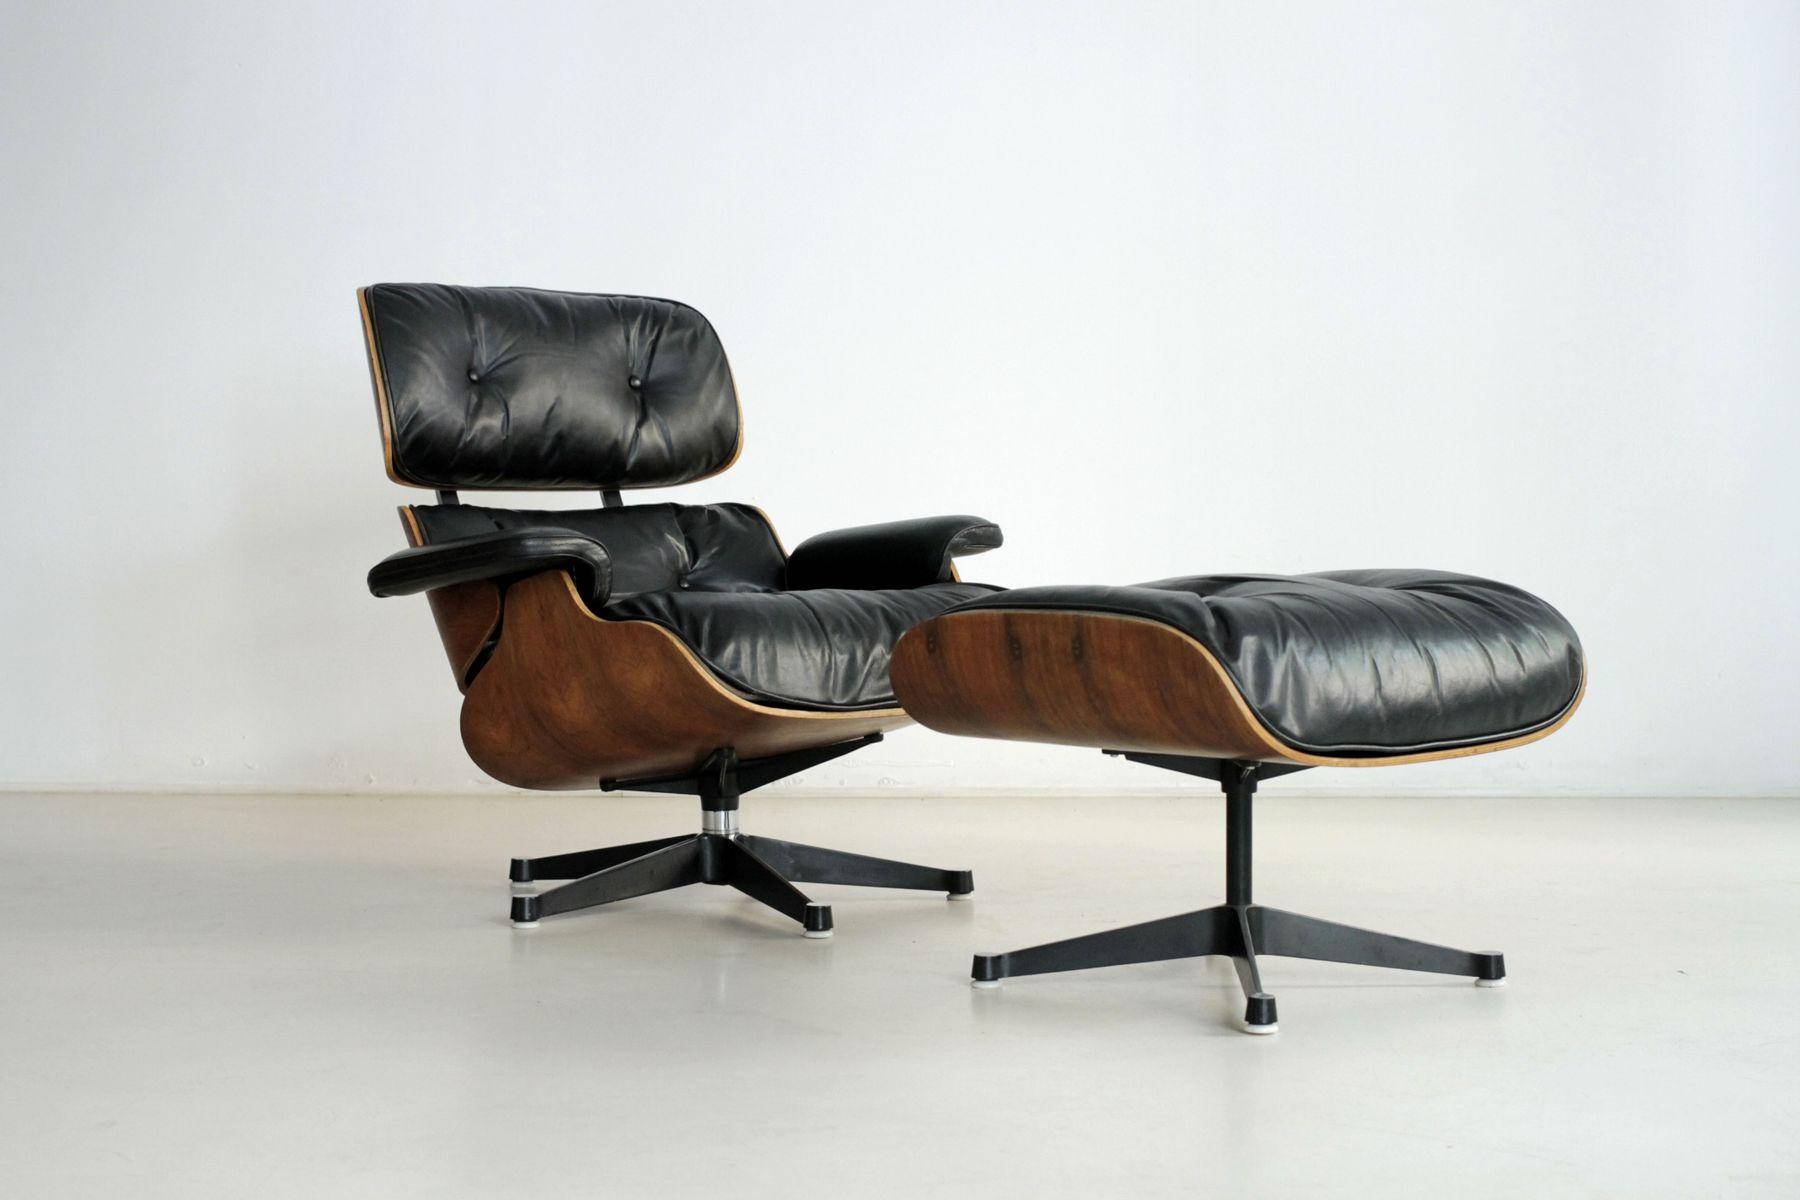 vintage drehsessel mit hocker von charles ray eames f r. Black Bedroom Furniture Sets. Home Design Ideas